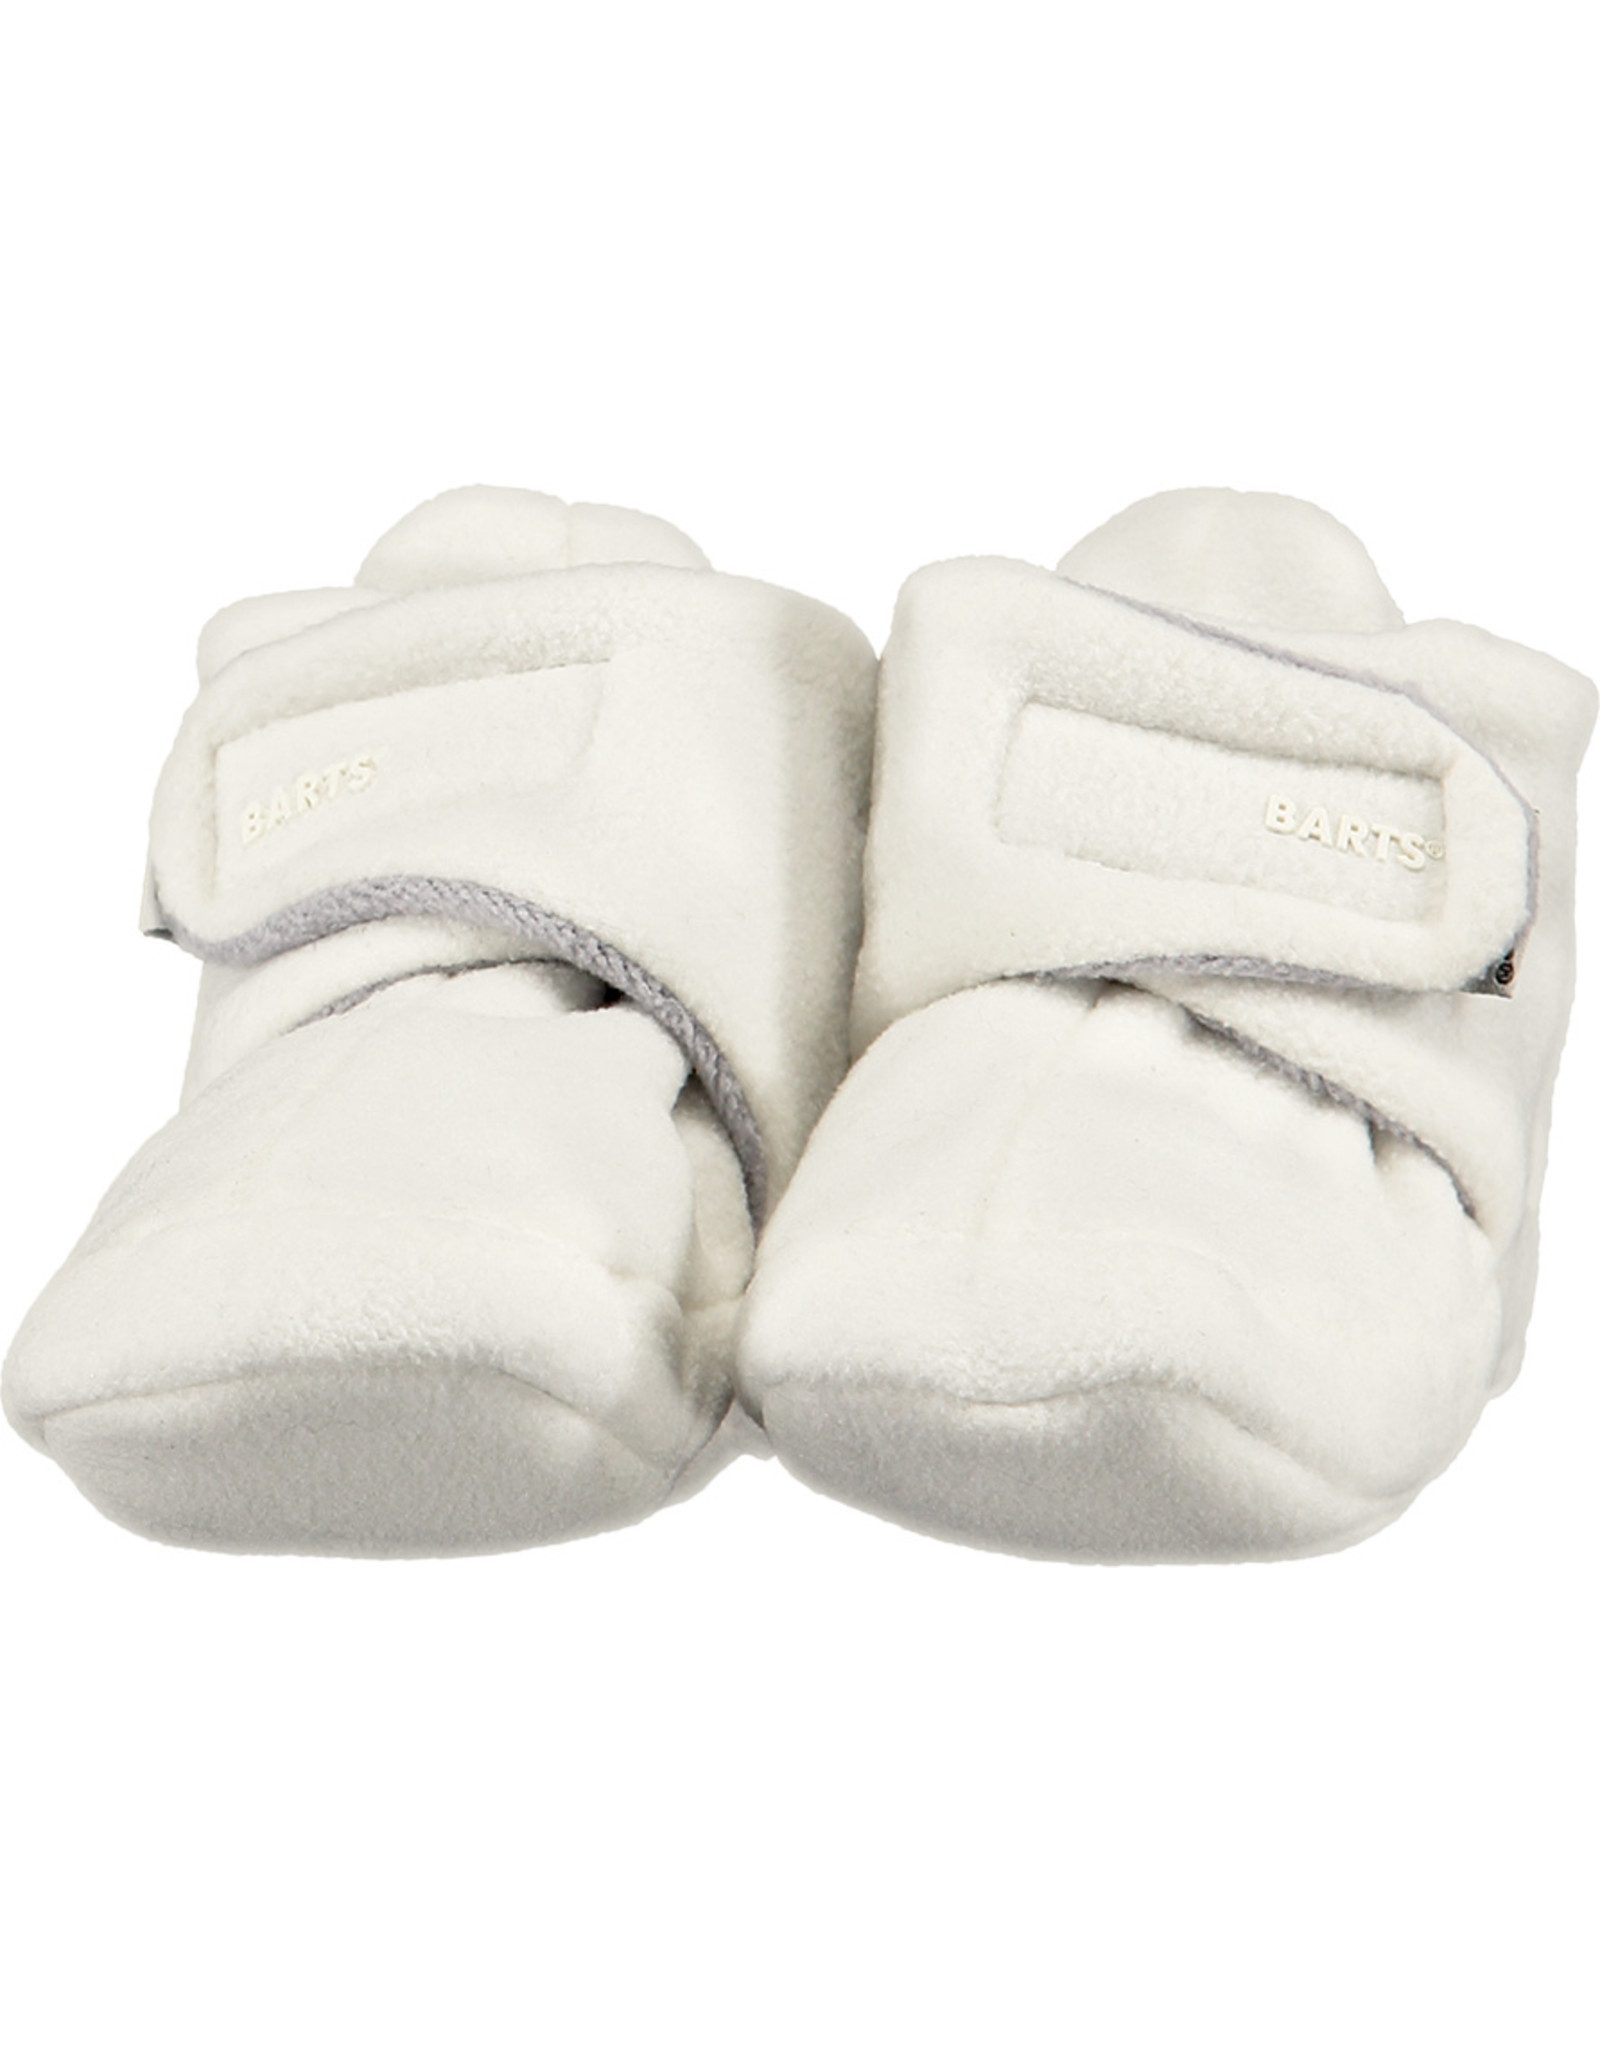 Barts Fleece Shoes, cream